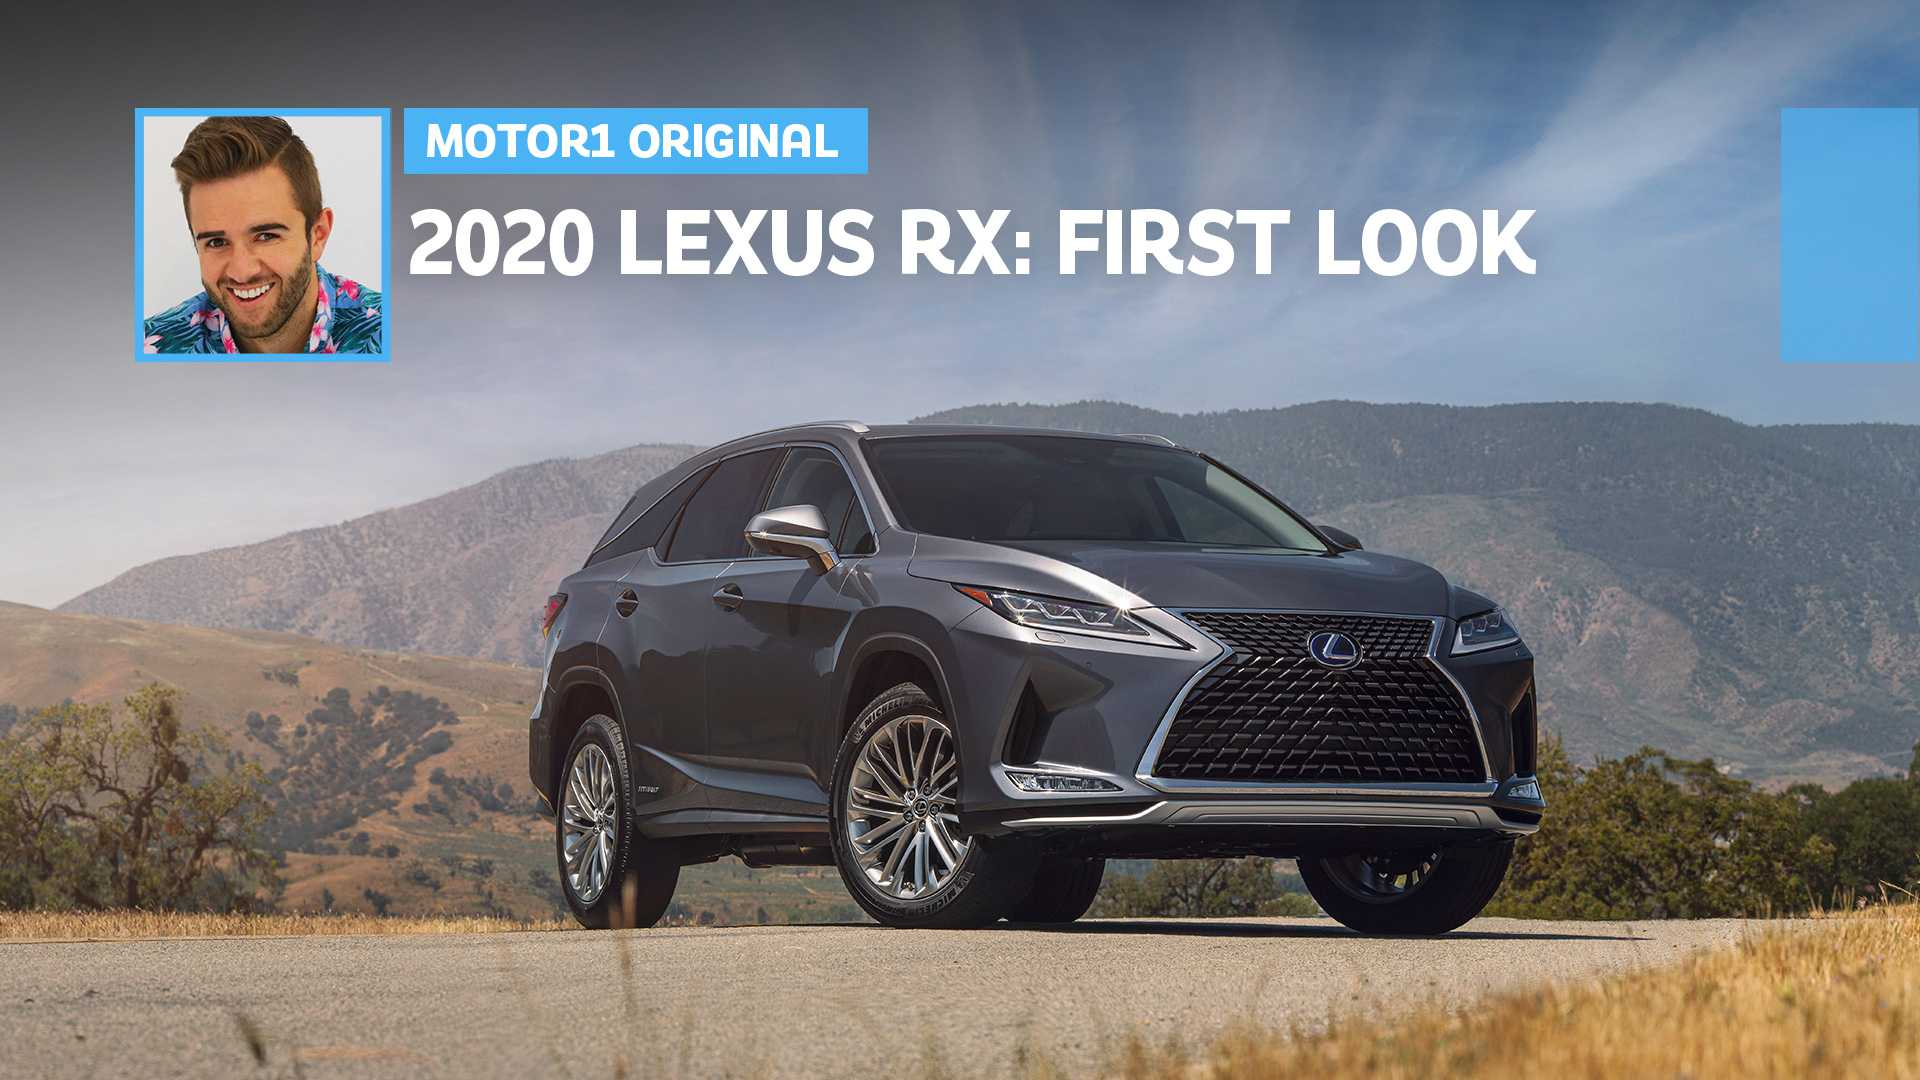 84 New Lexus Rx Update 2020 Reviews with Lexus Rx Update 2020